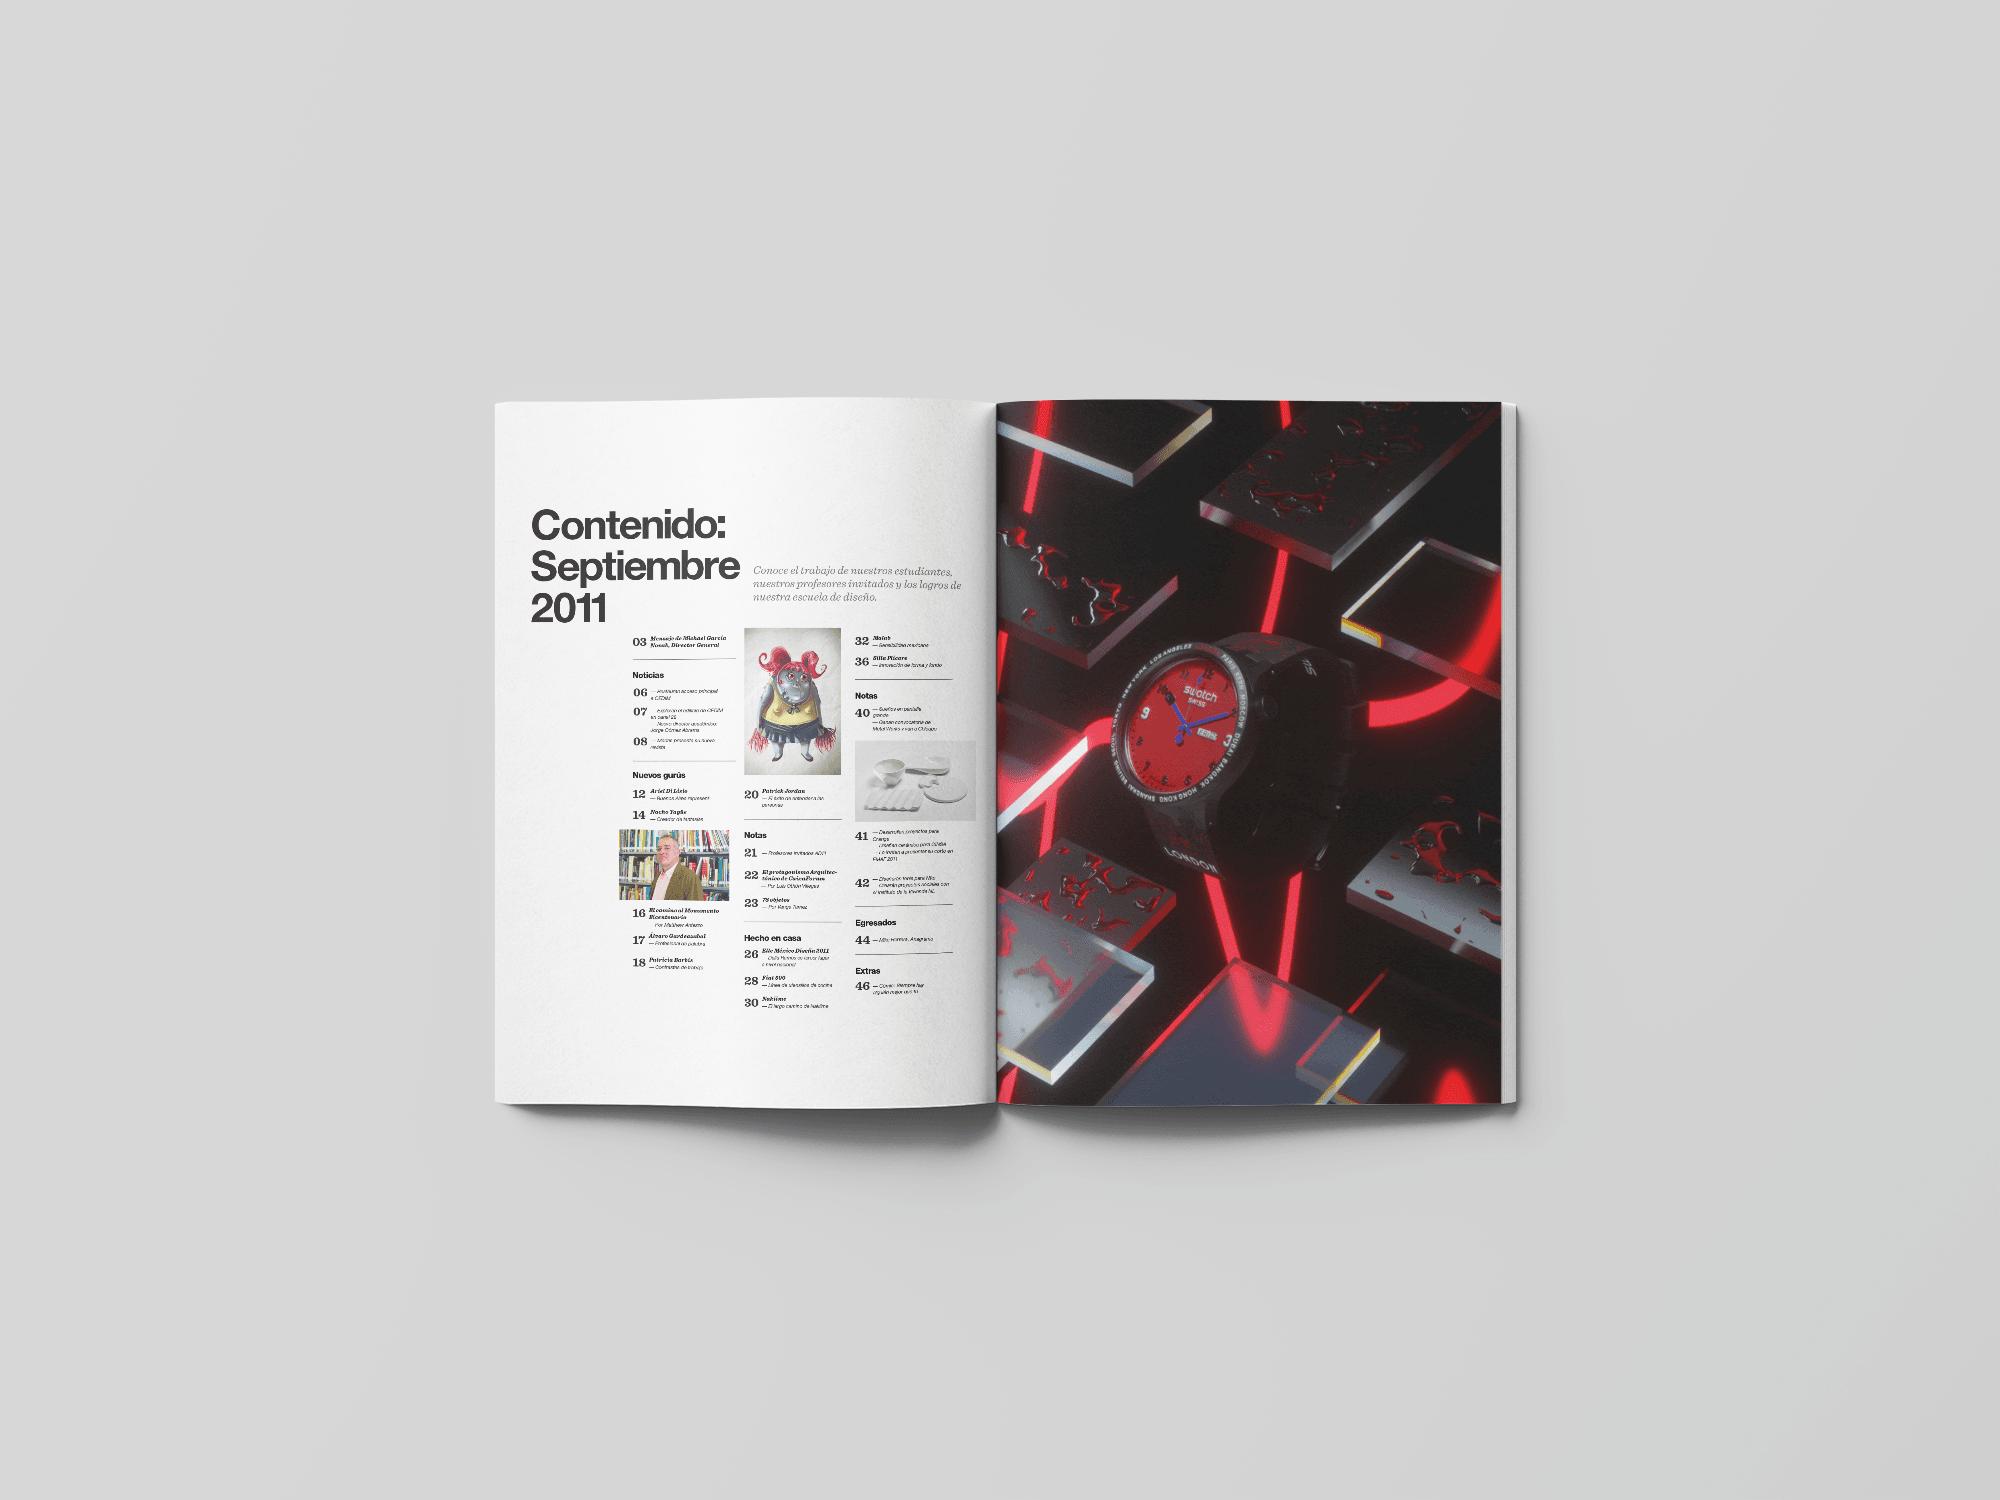 spread03-neue-magazine-cedim-yoenpaperland-compressor